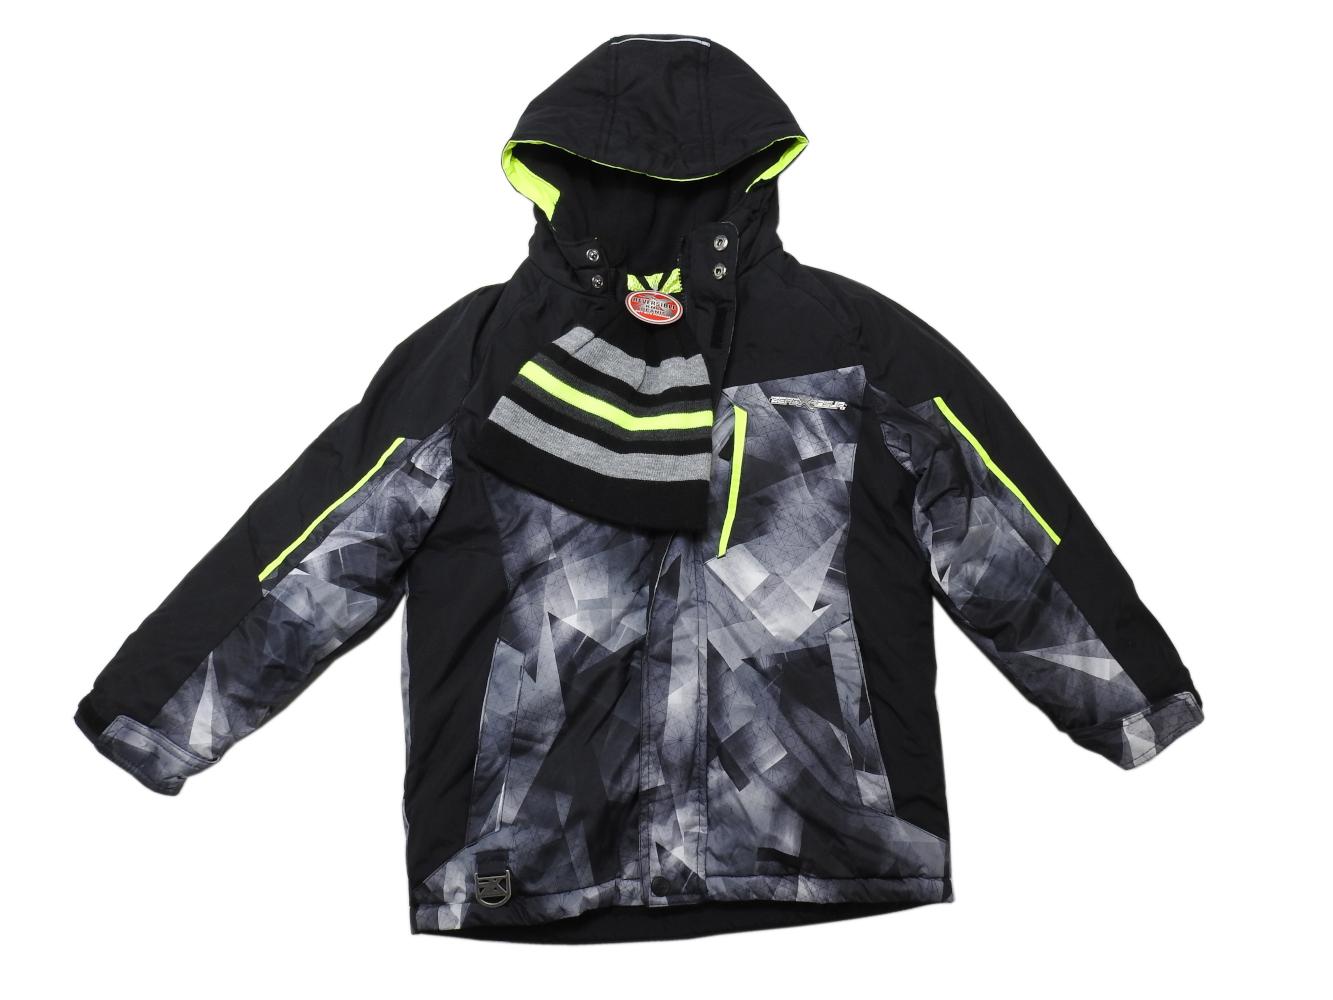 e0da7faf4 ZeroXposur Boys Size 7/8 Hooded Full-Zip Extreme Snowboard Jacket /Beanie,  Black